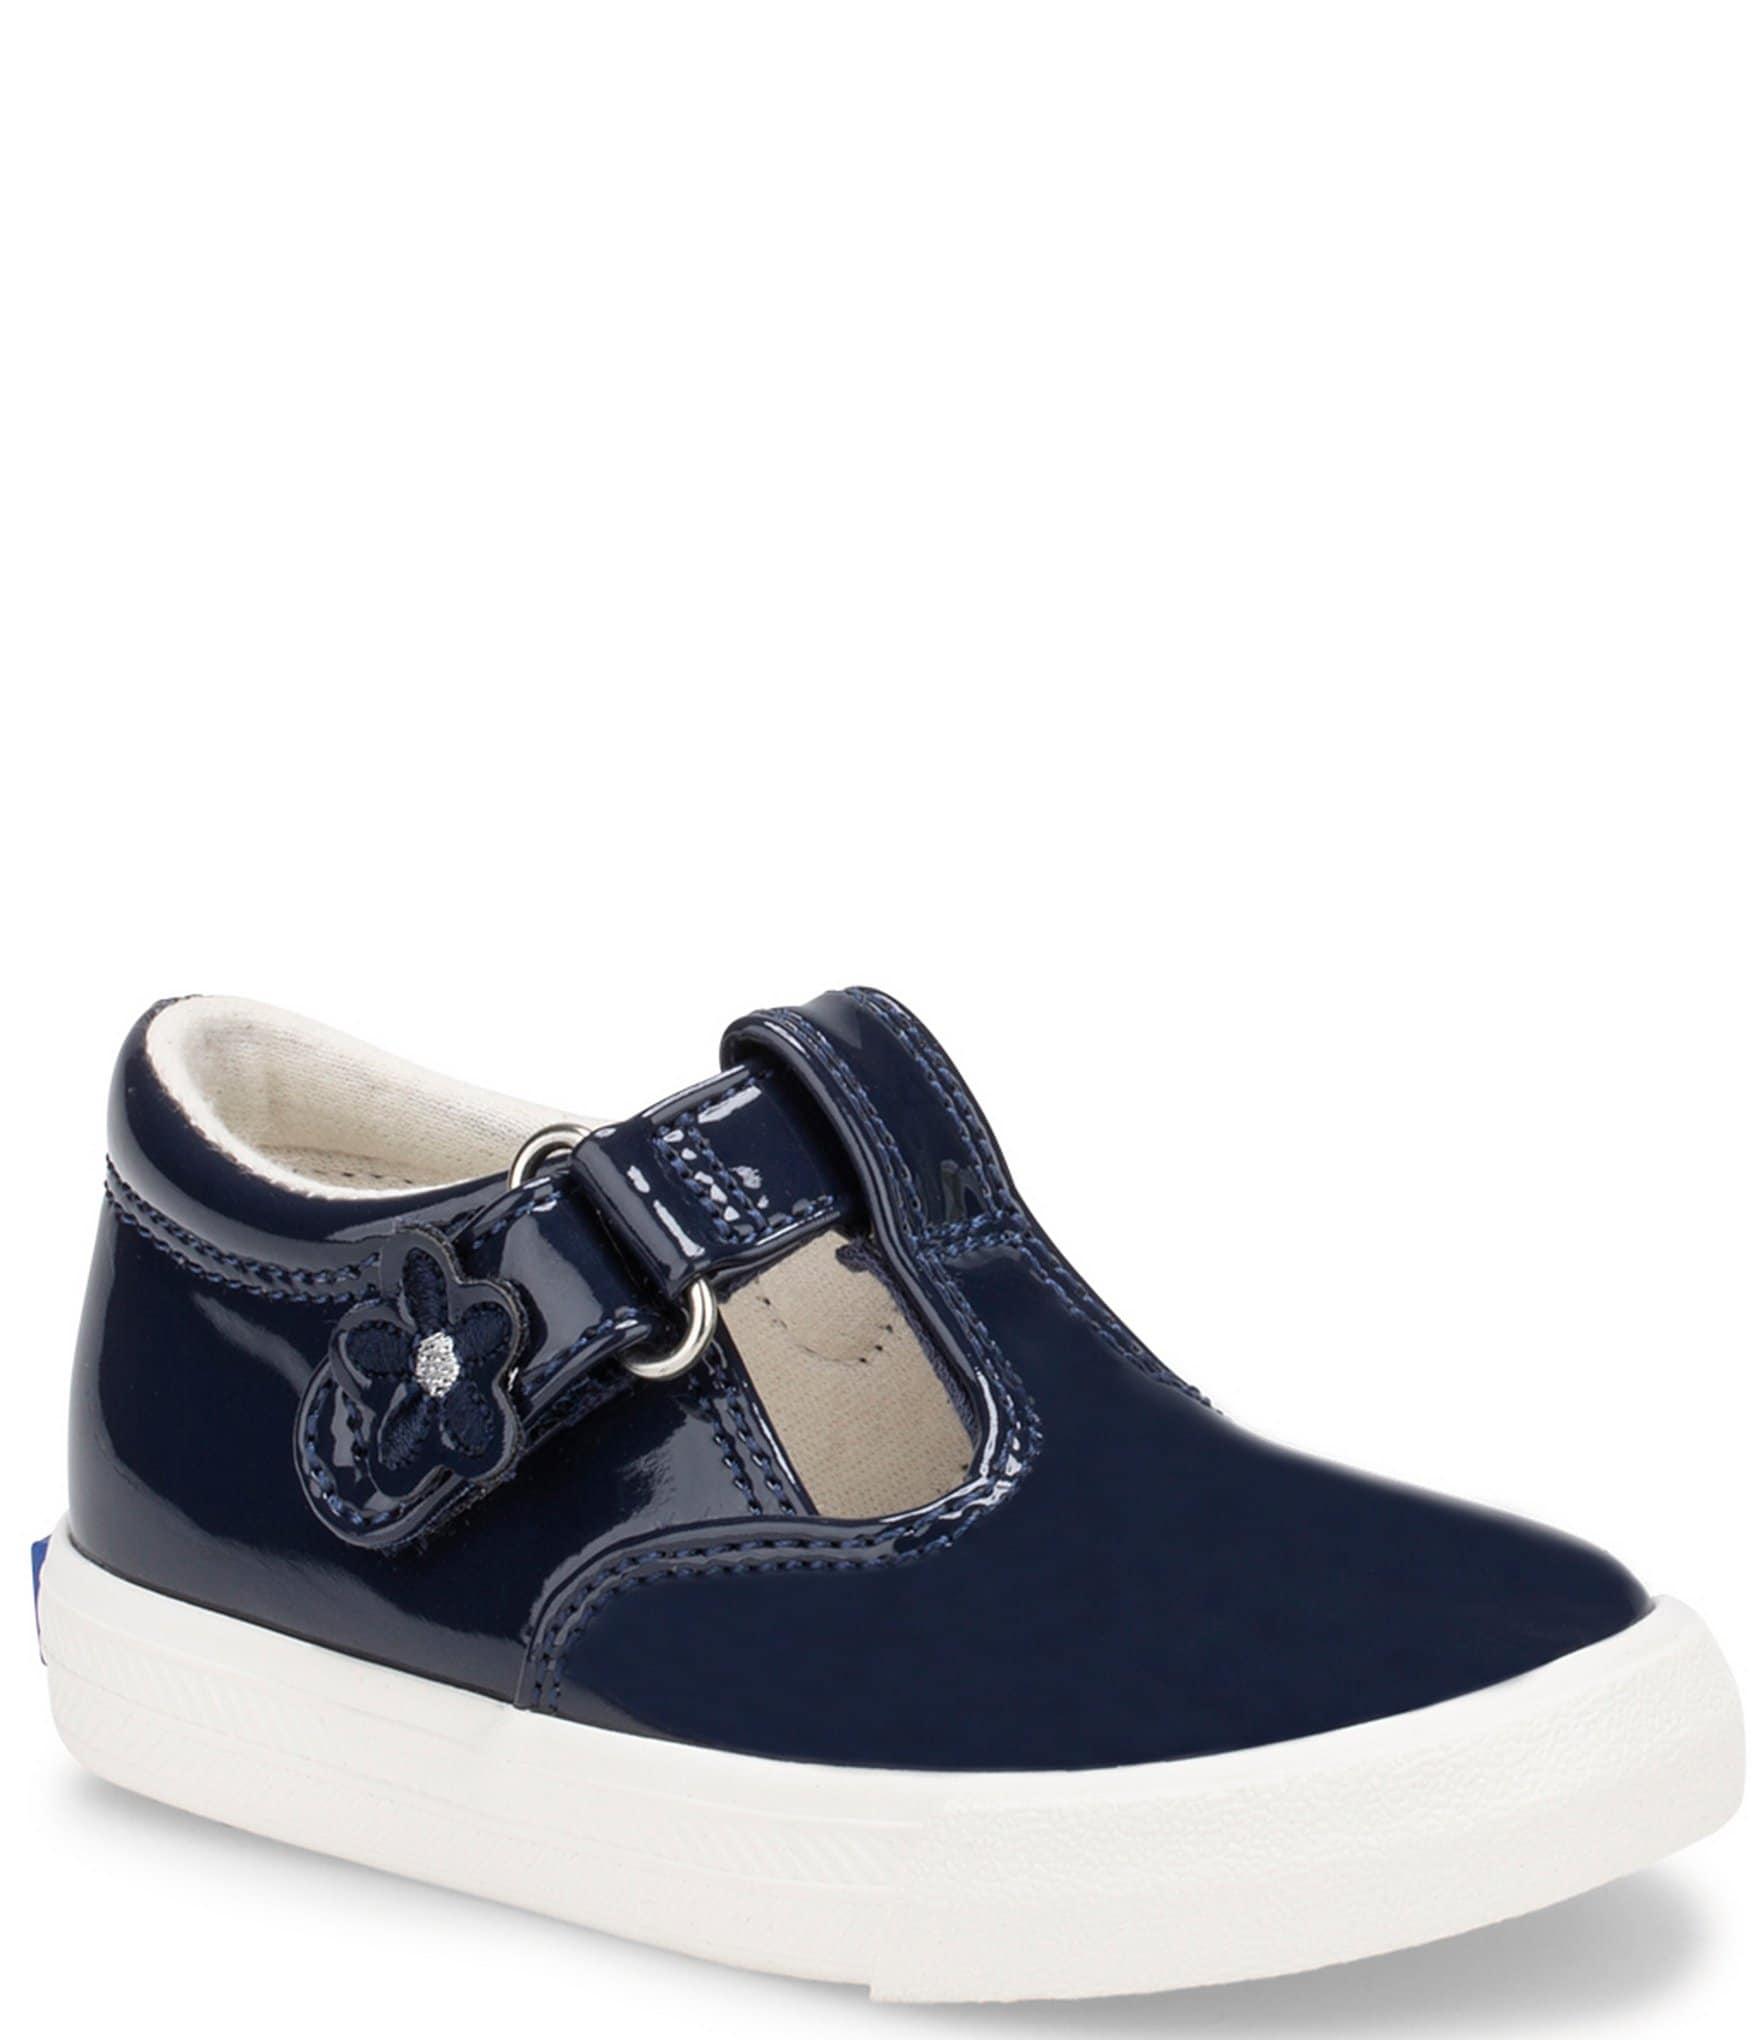 Keds Girls' Daphne Patent T-Strap Shoes